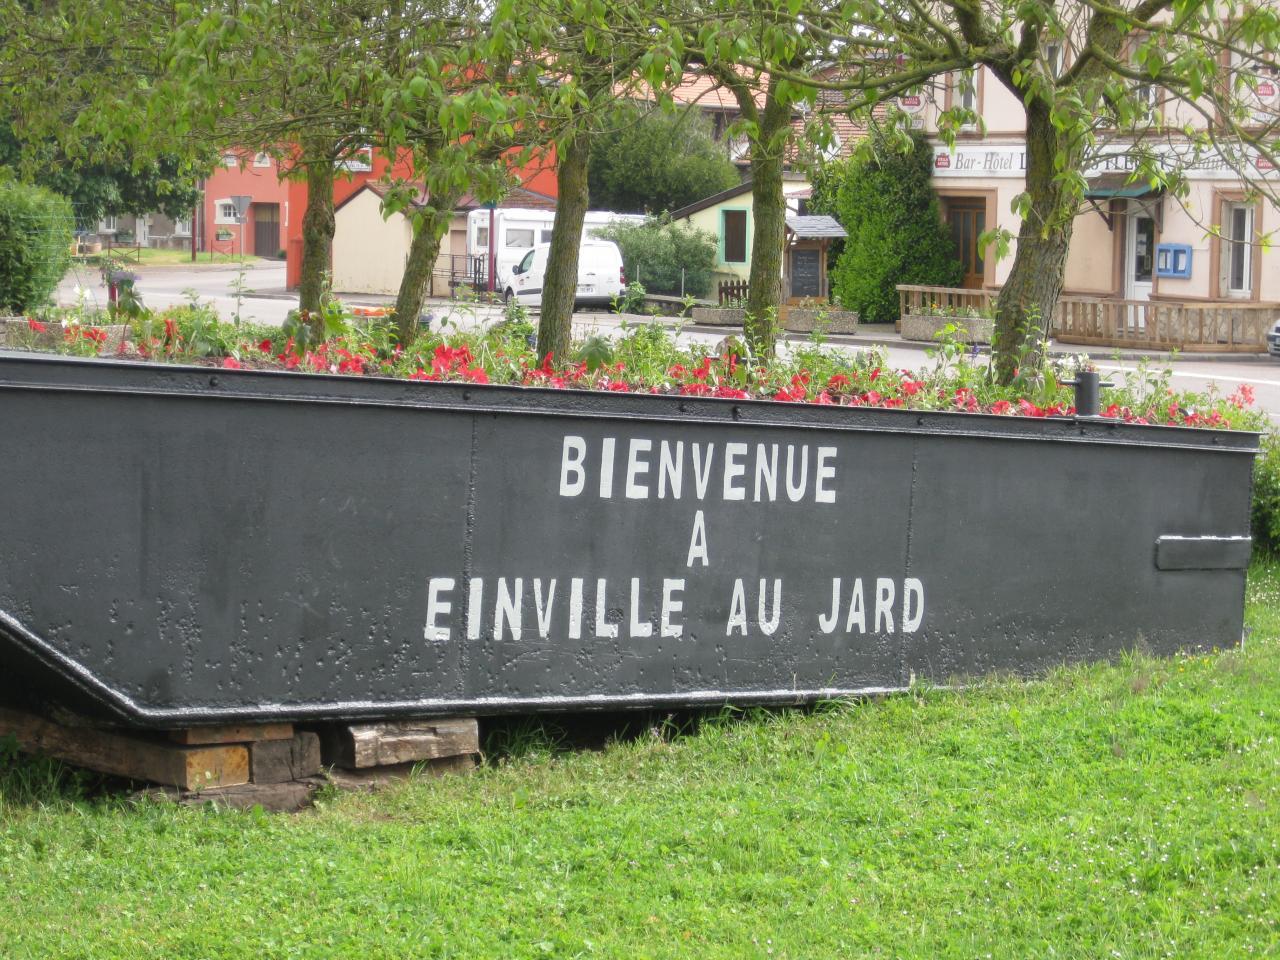 Halte de Einville au Jard